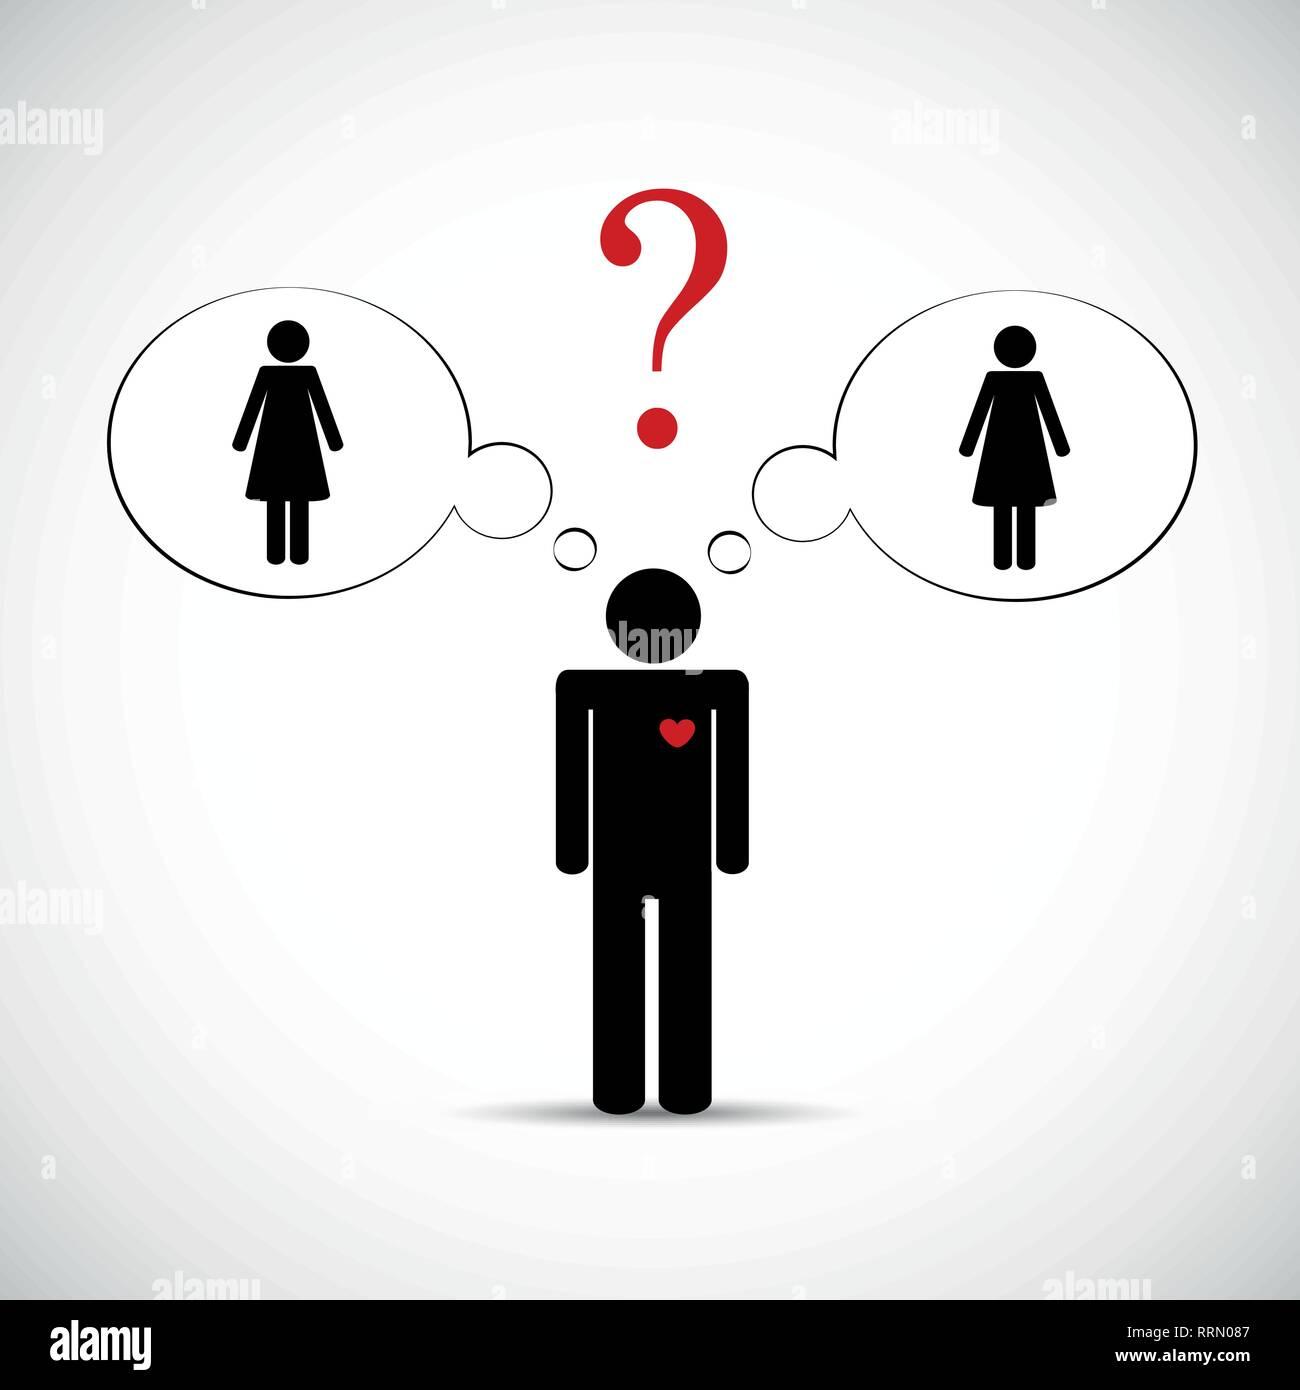 Frauen wie denken Wie denken